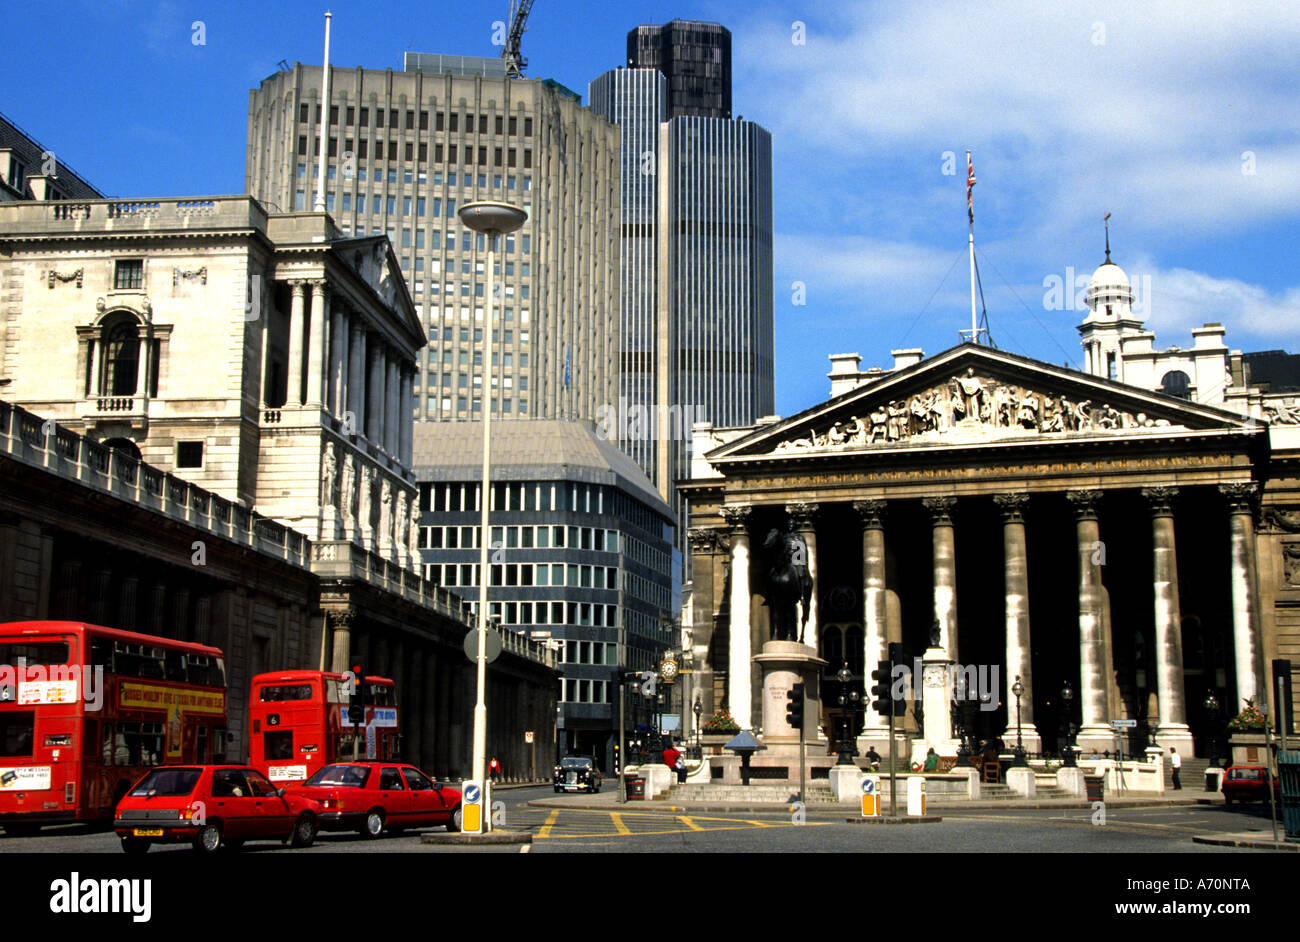 The Royal Exchange City  Stock Bank Banking London - Stock Image